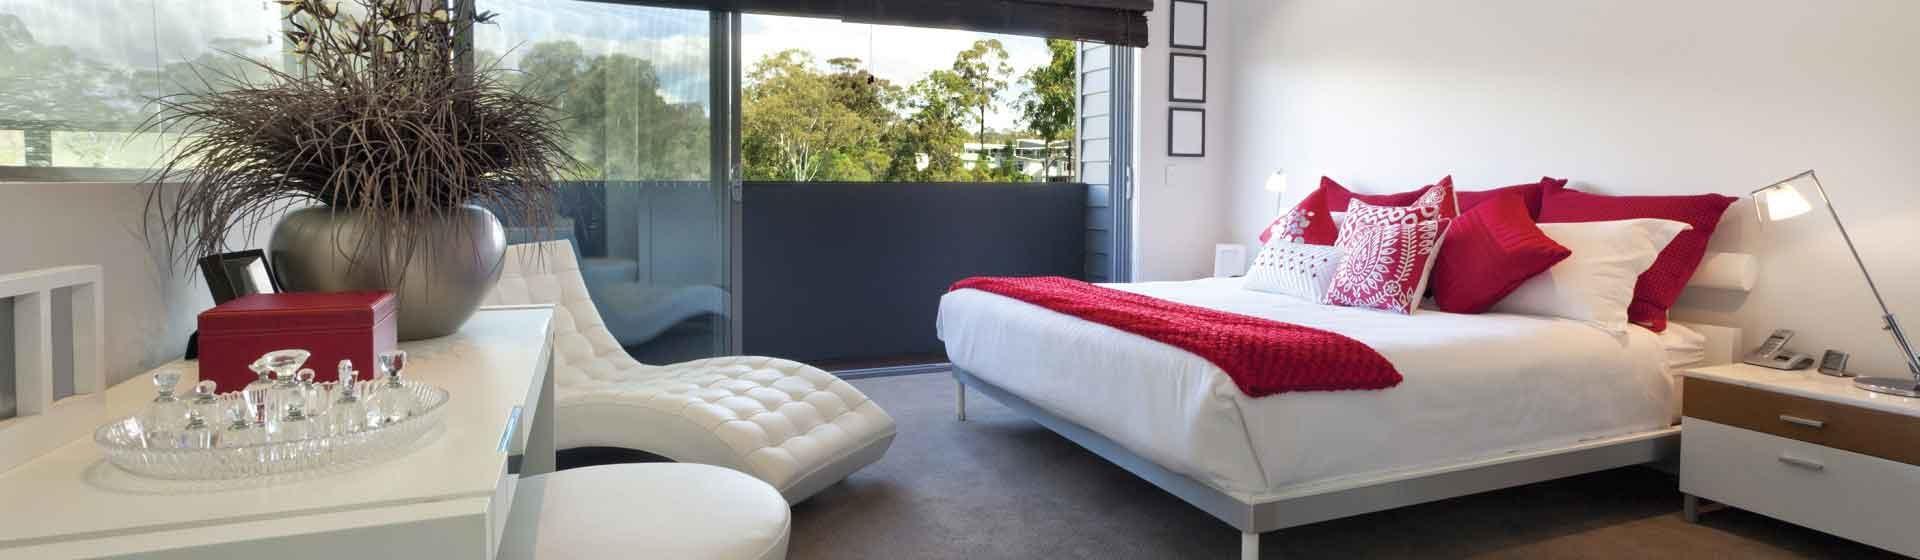 gestion apartamentos turisticos madrid